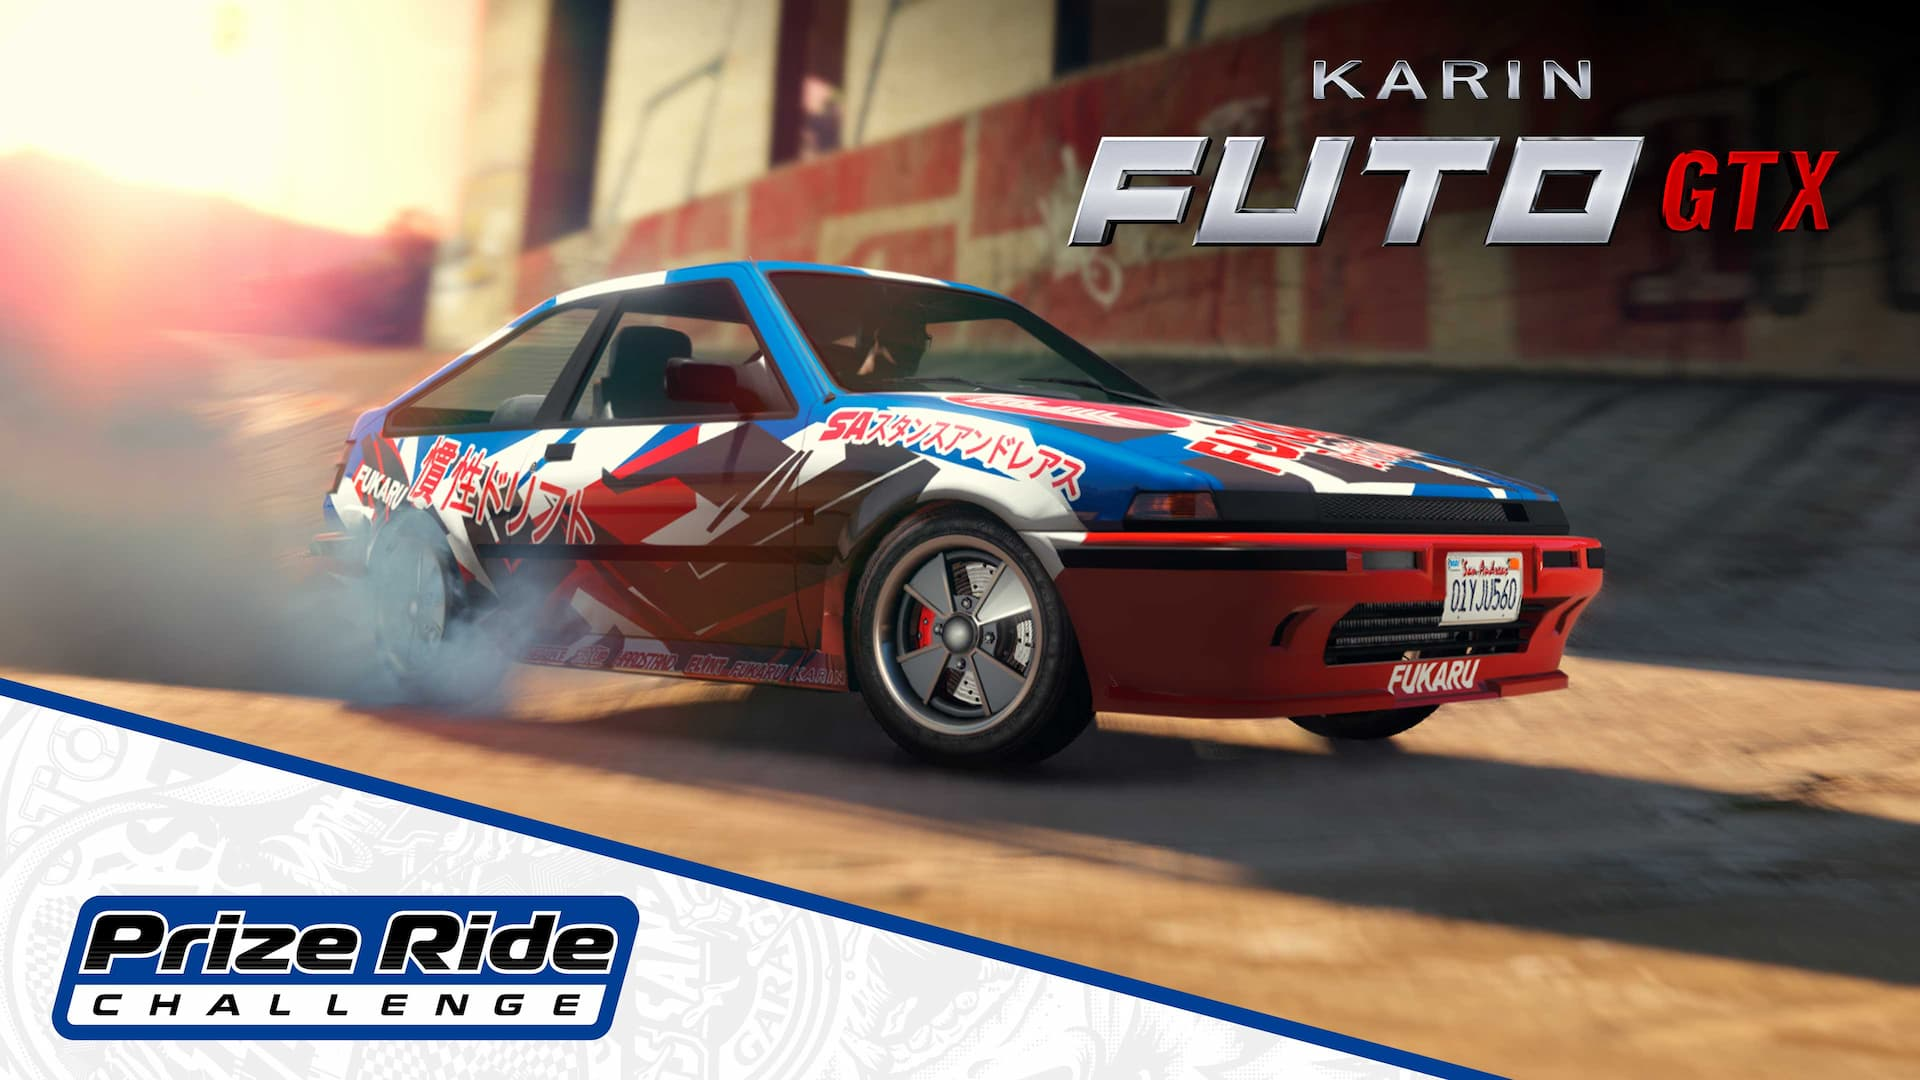 GTA Online Prize Ride Futo GTX